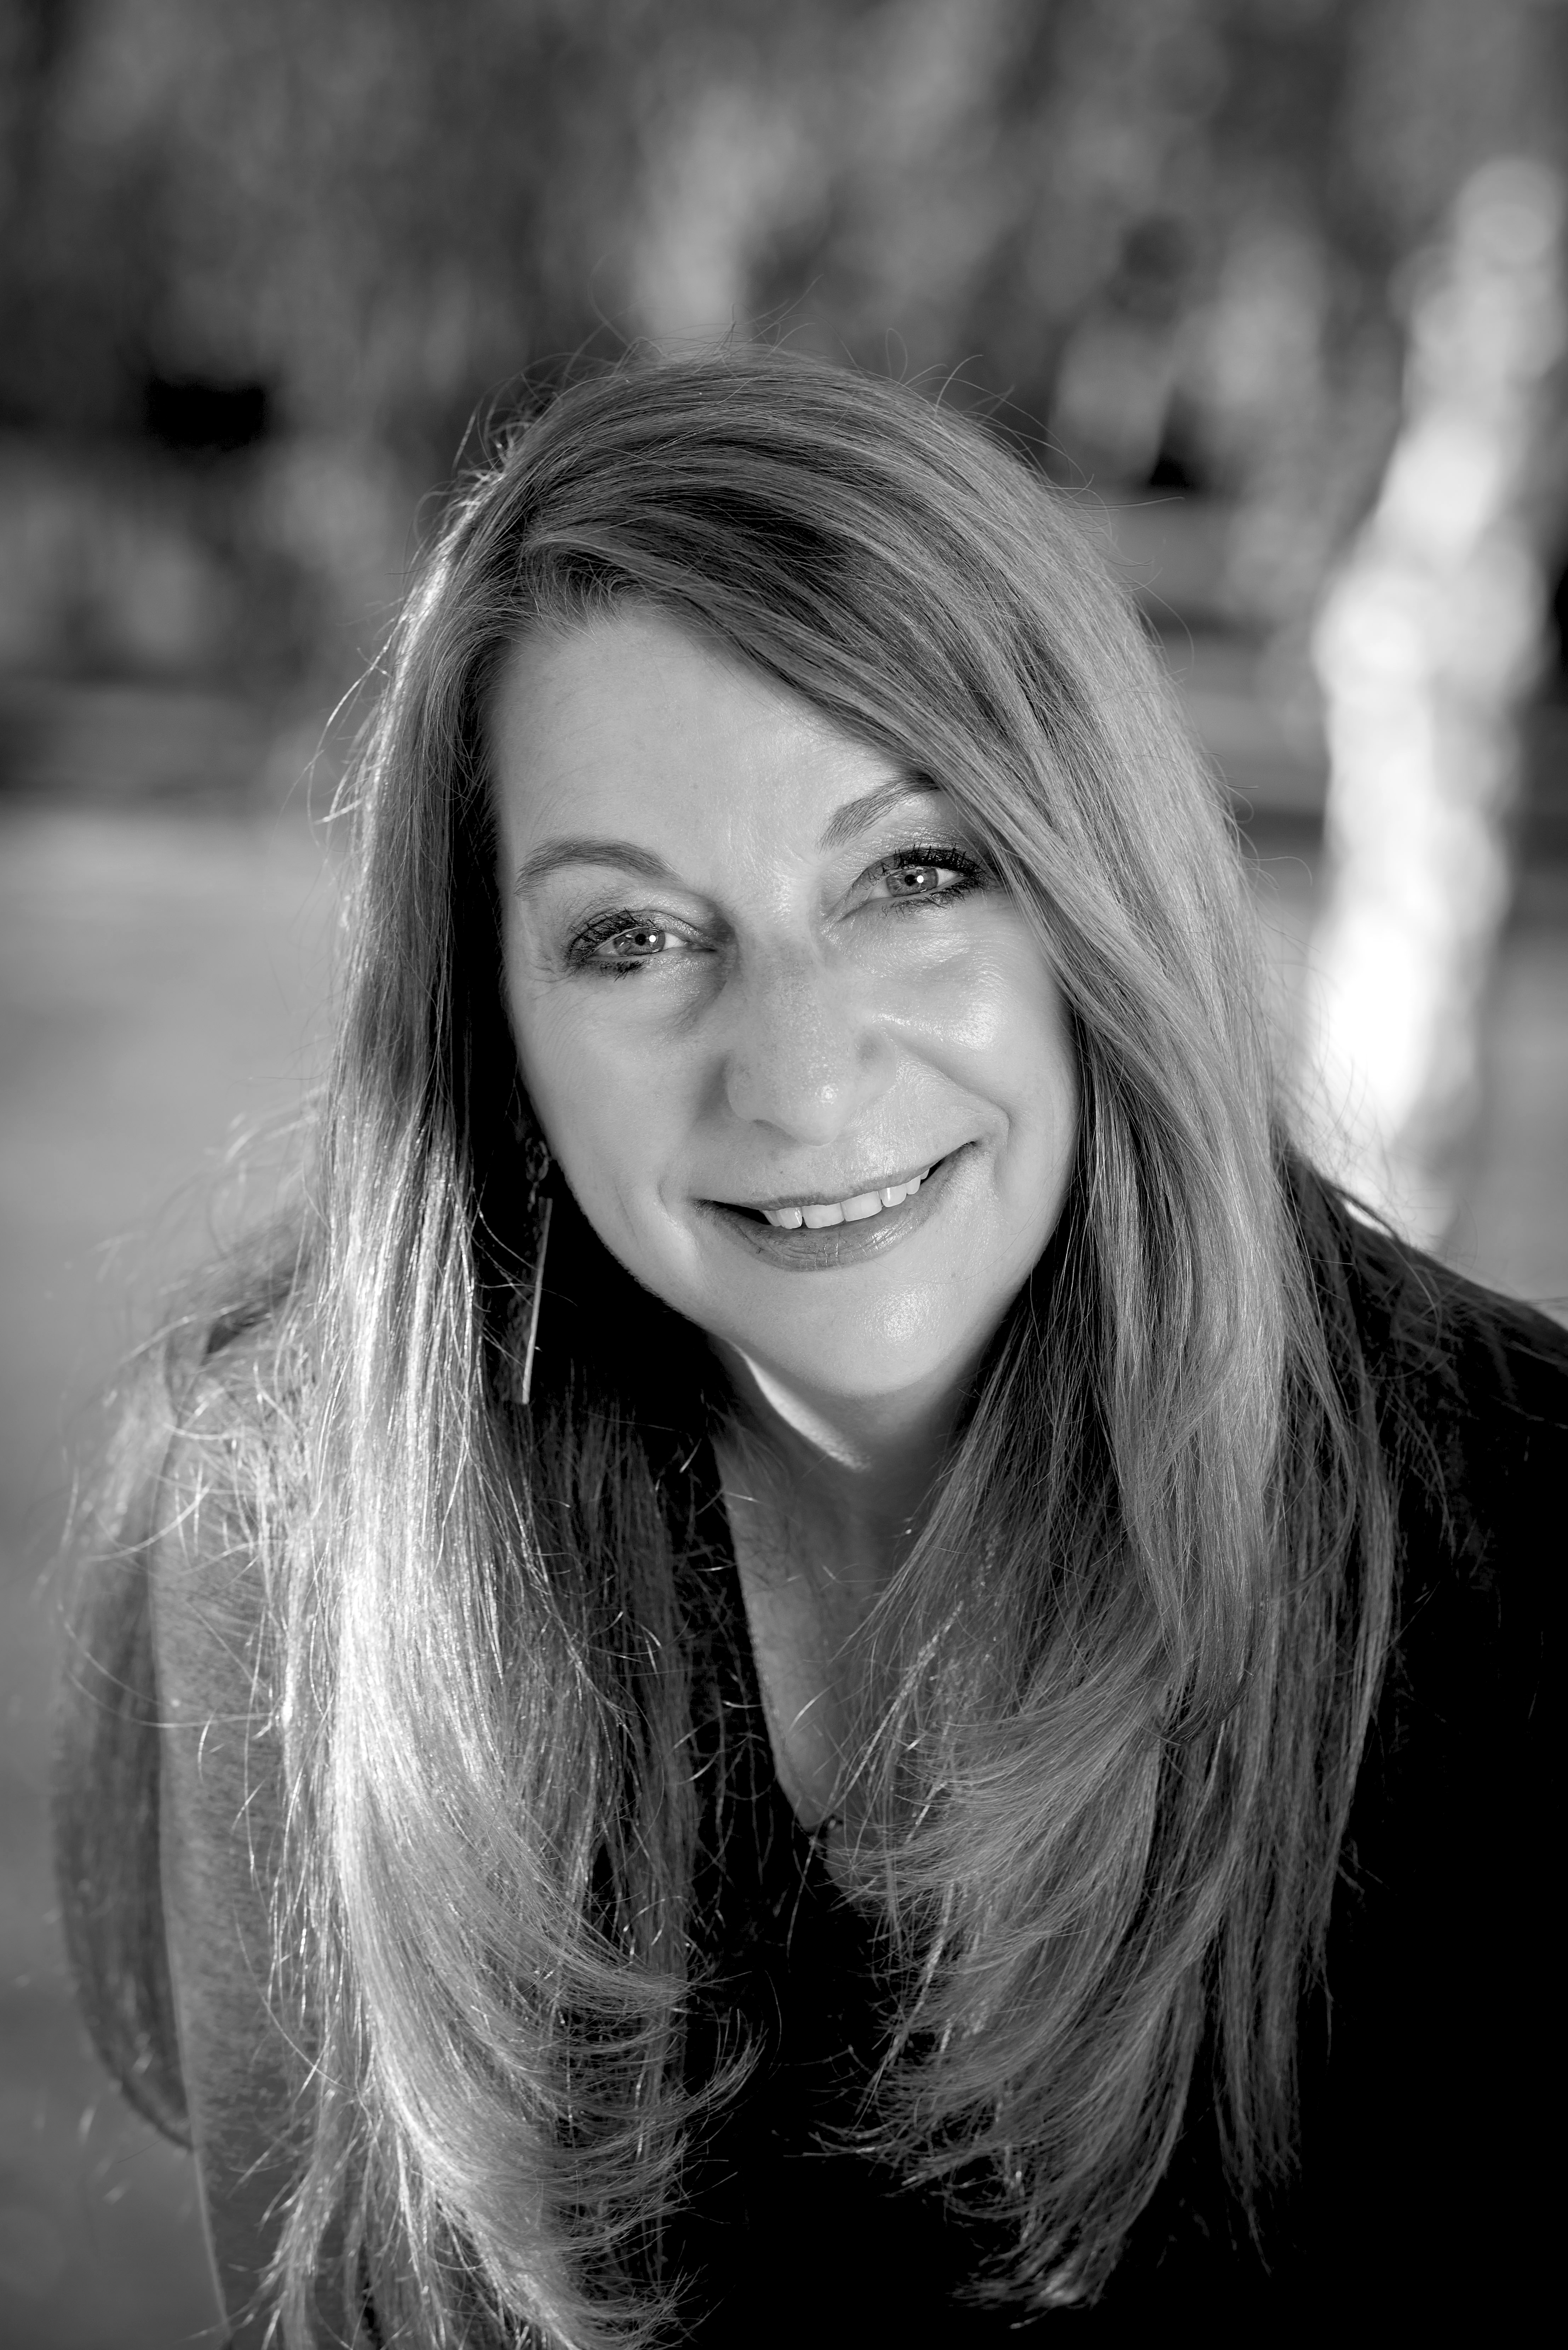 Sally Jo Freund